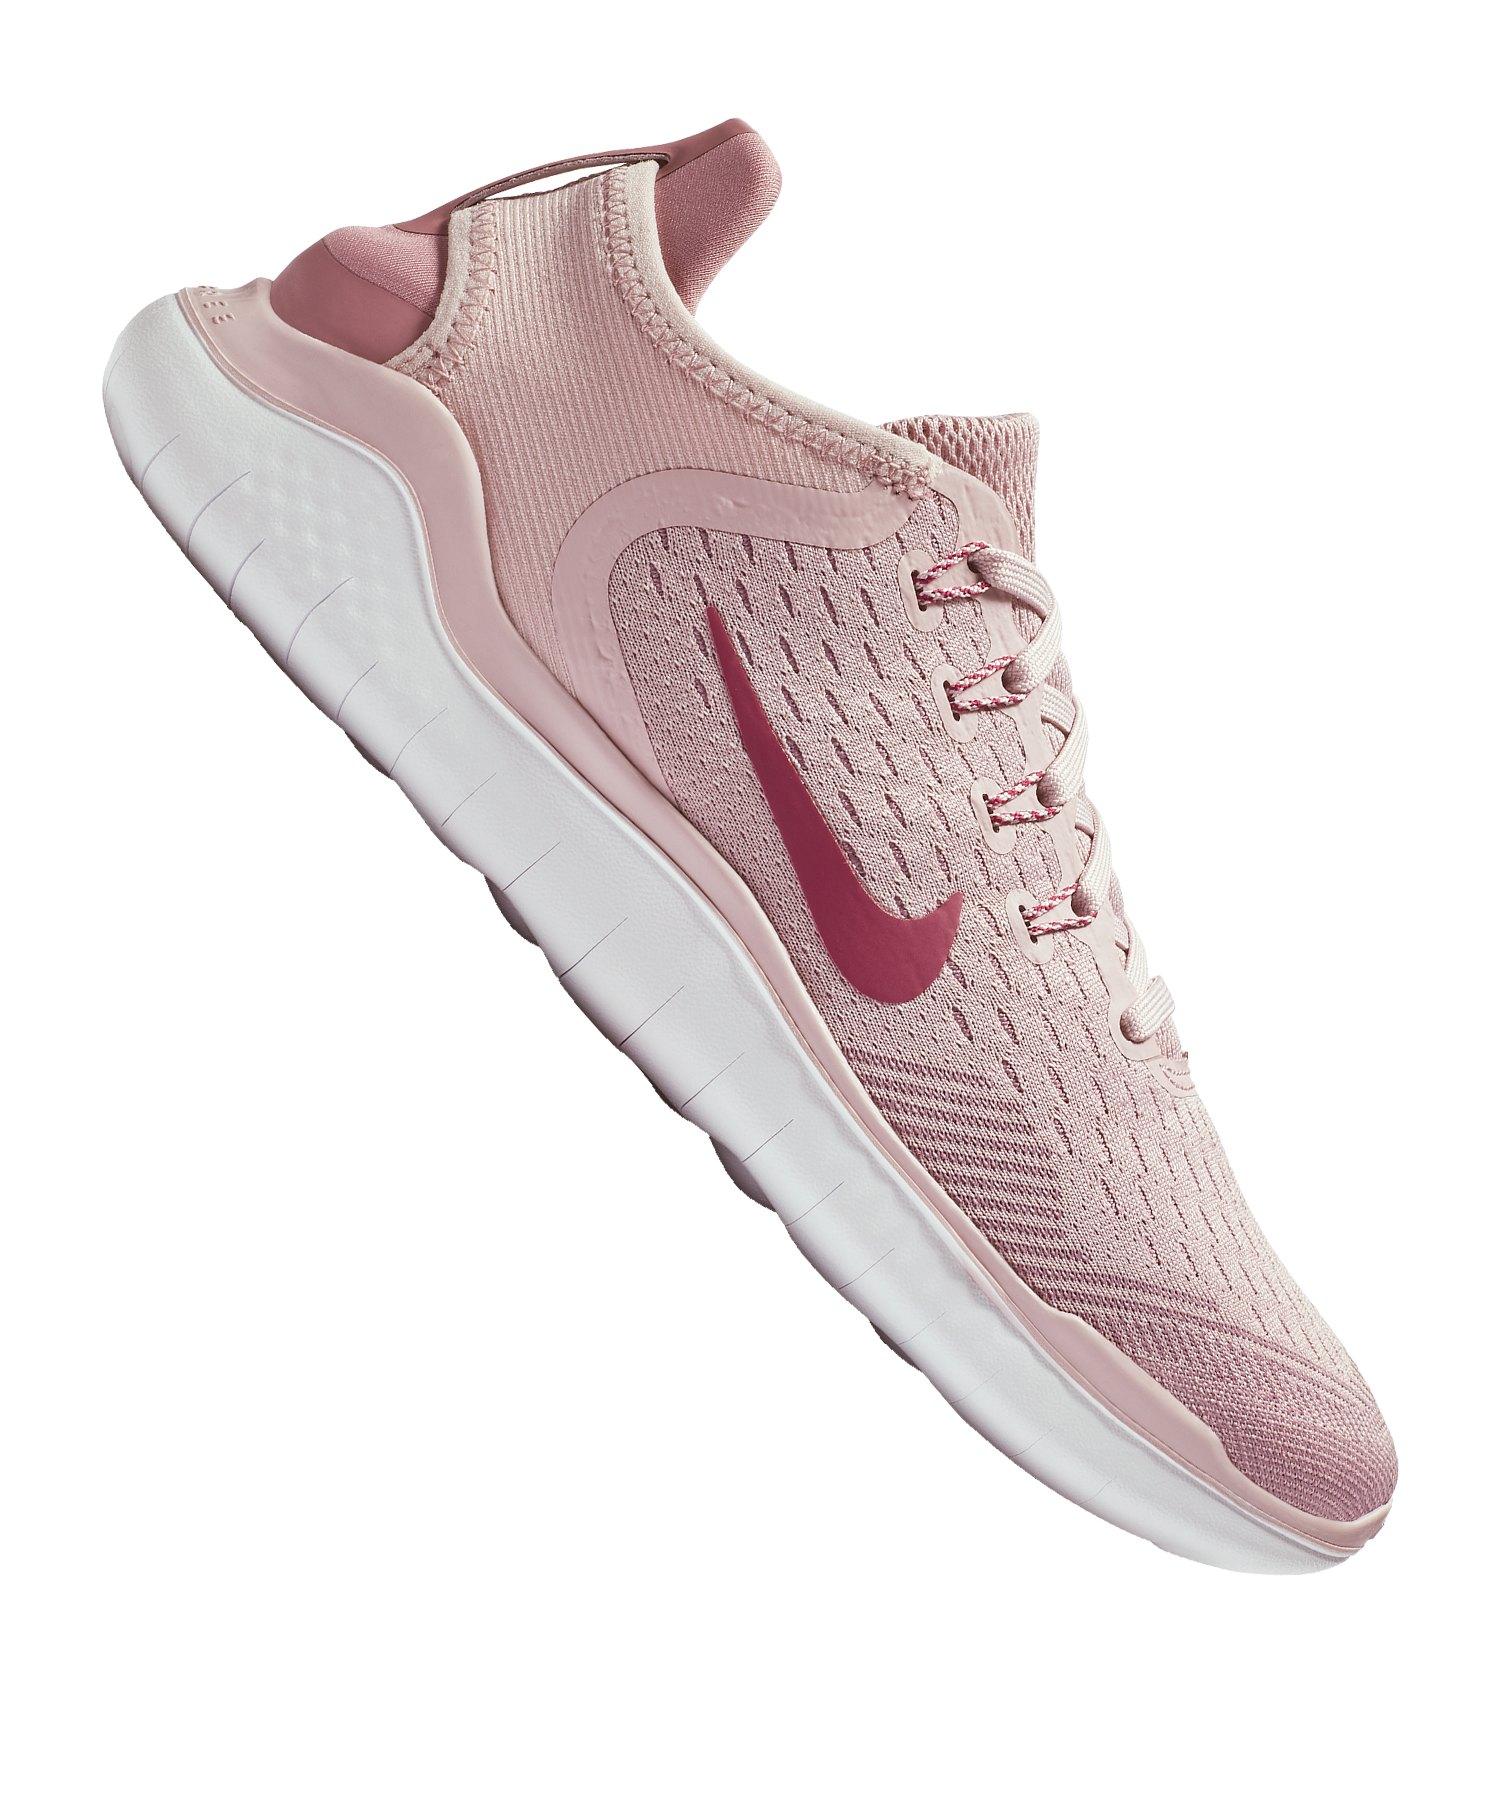 detailed look b0ef8 fe064 Nike Free RN 2018 Running Damen Rosa F500 - rosa